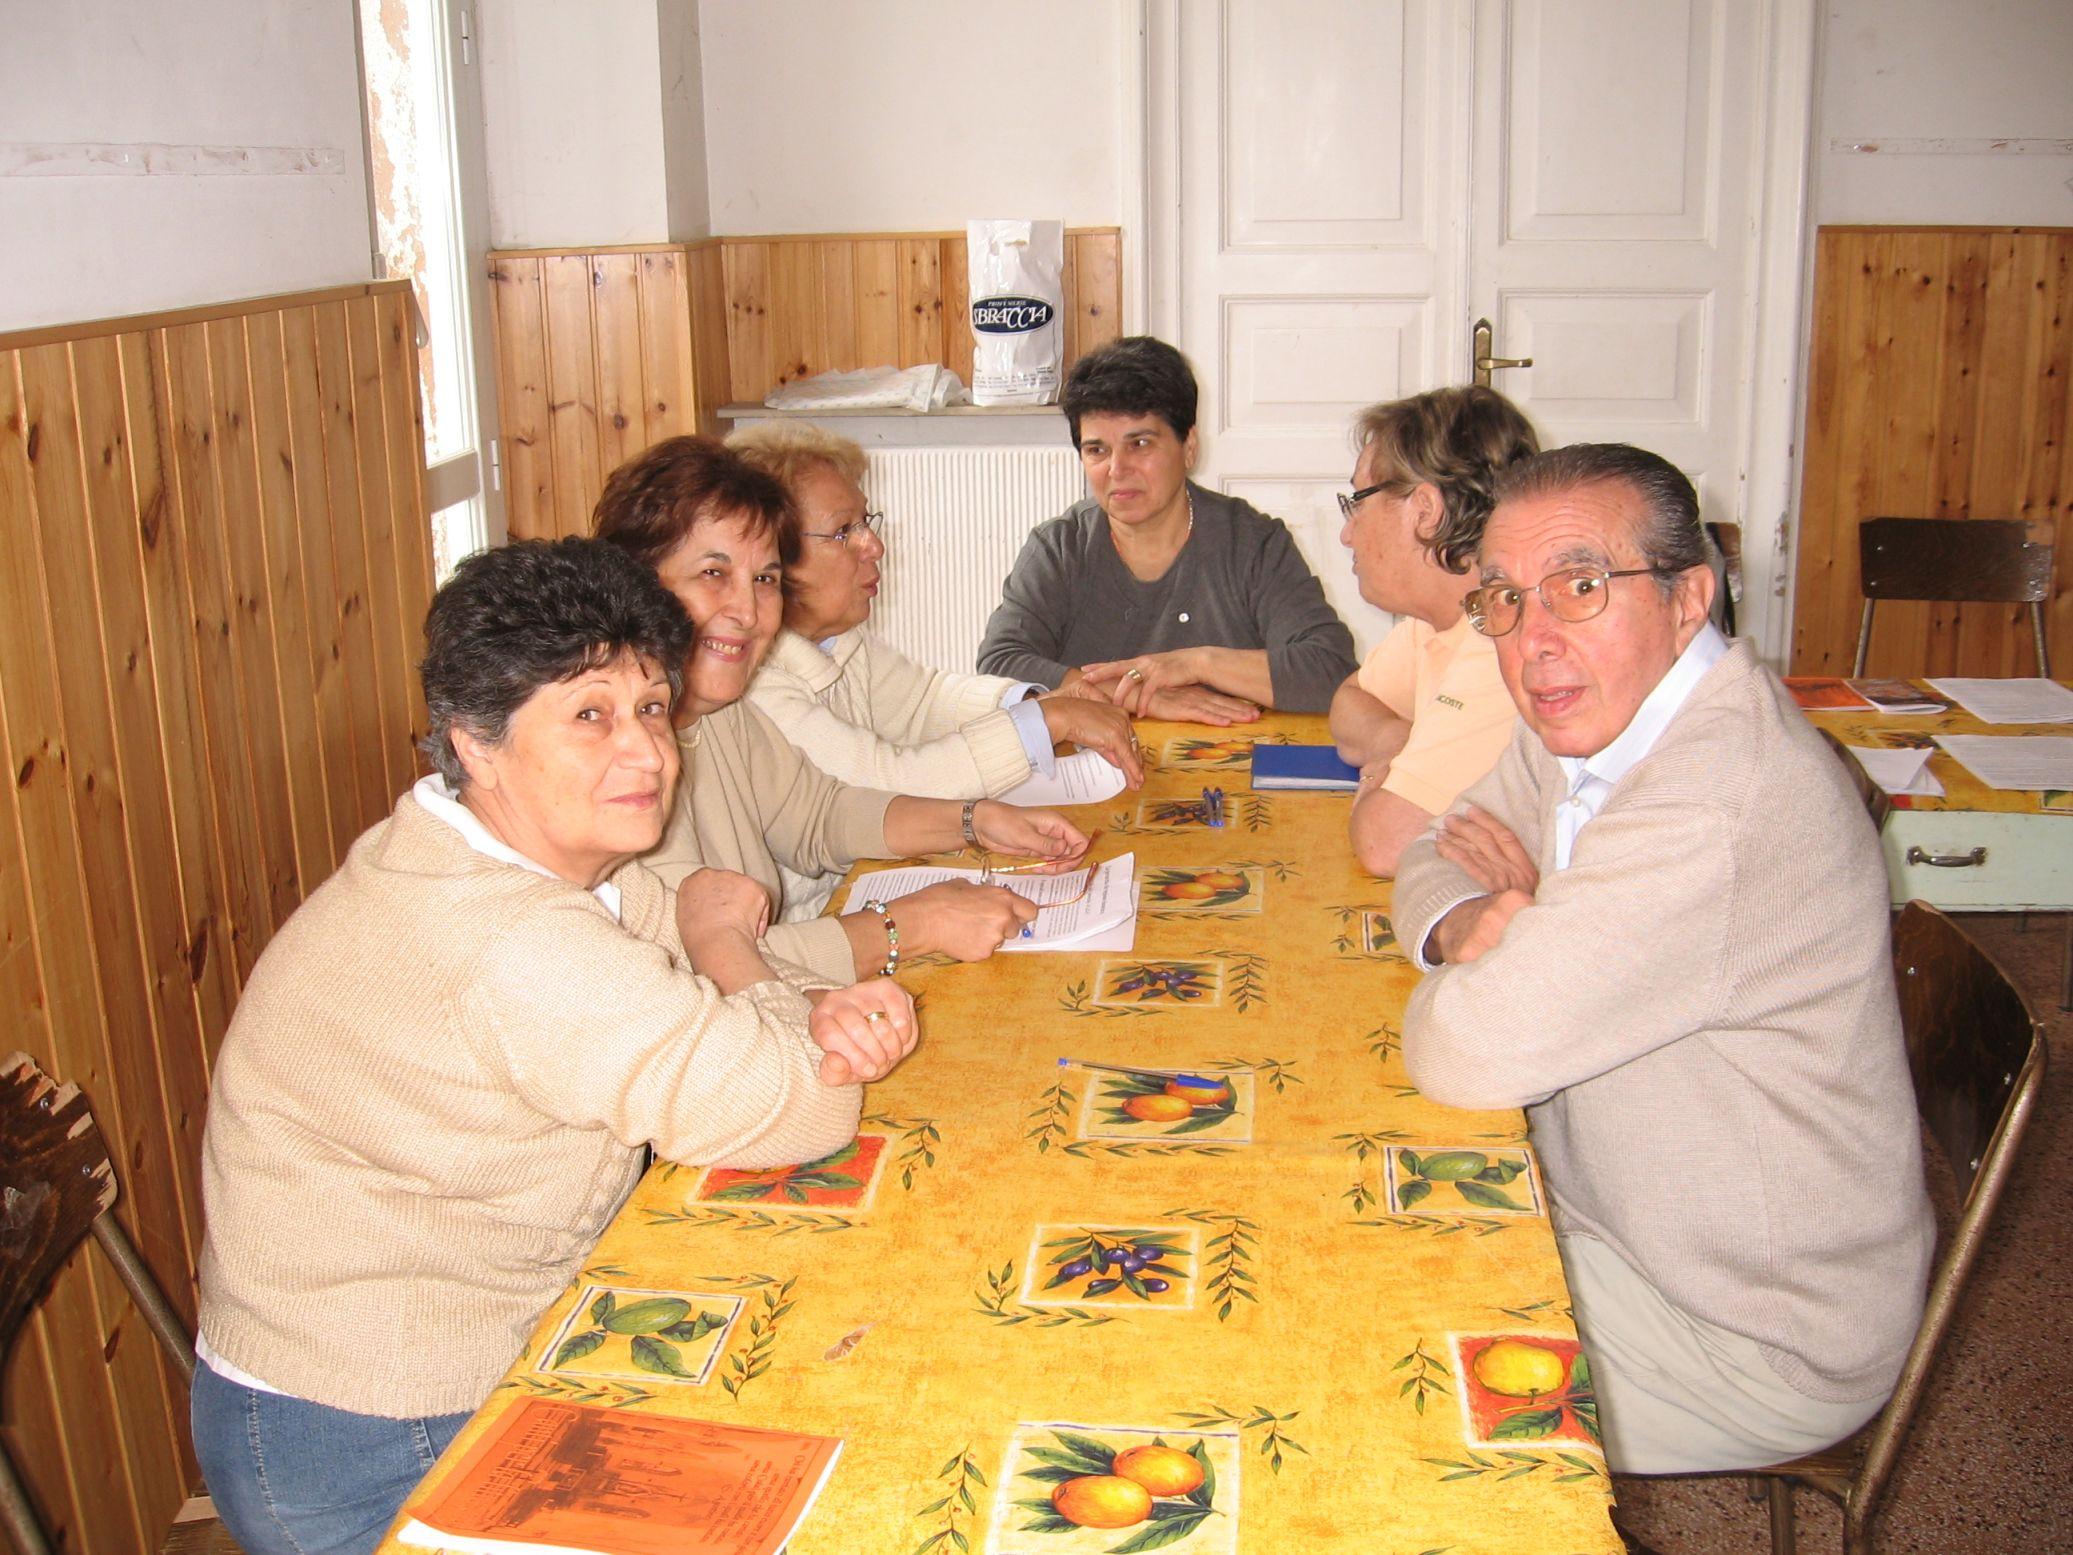 Bivacco_Persone_Impegnate_Torriglia-2009-09-20--10.59.23